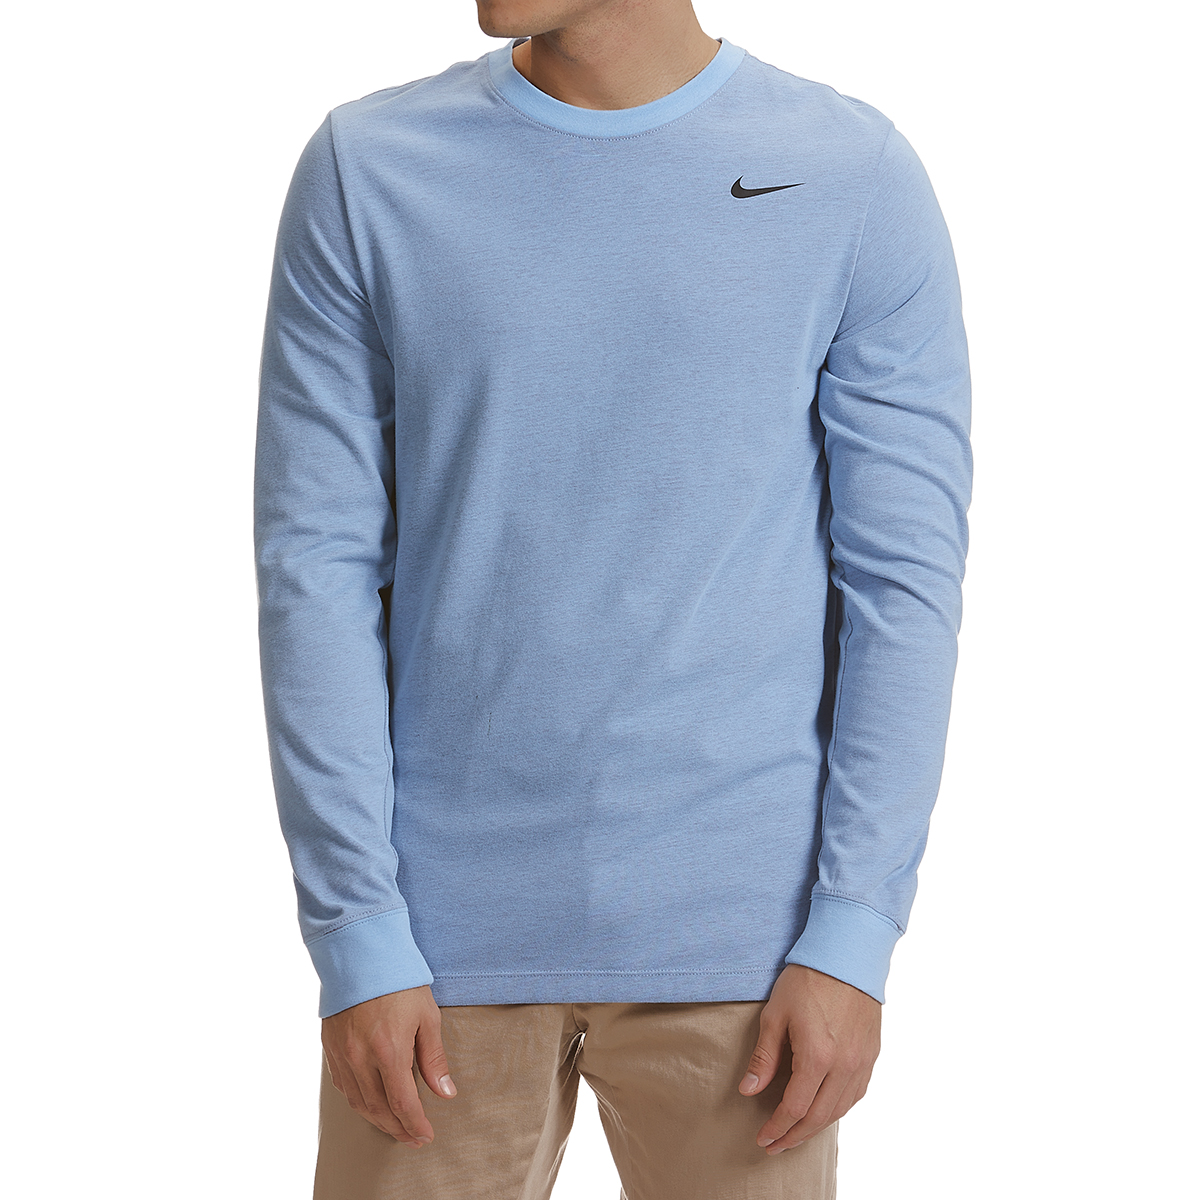 Nike Men's Long-Sleeve Dri-Fit Tee - Blue, XXL